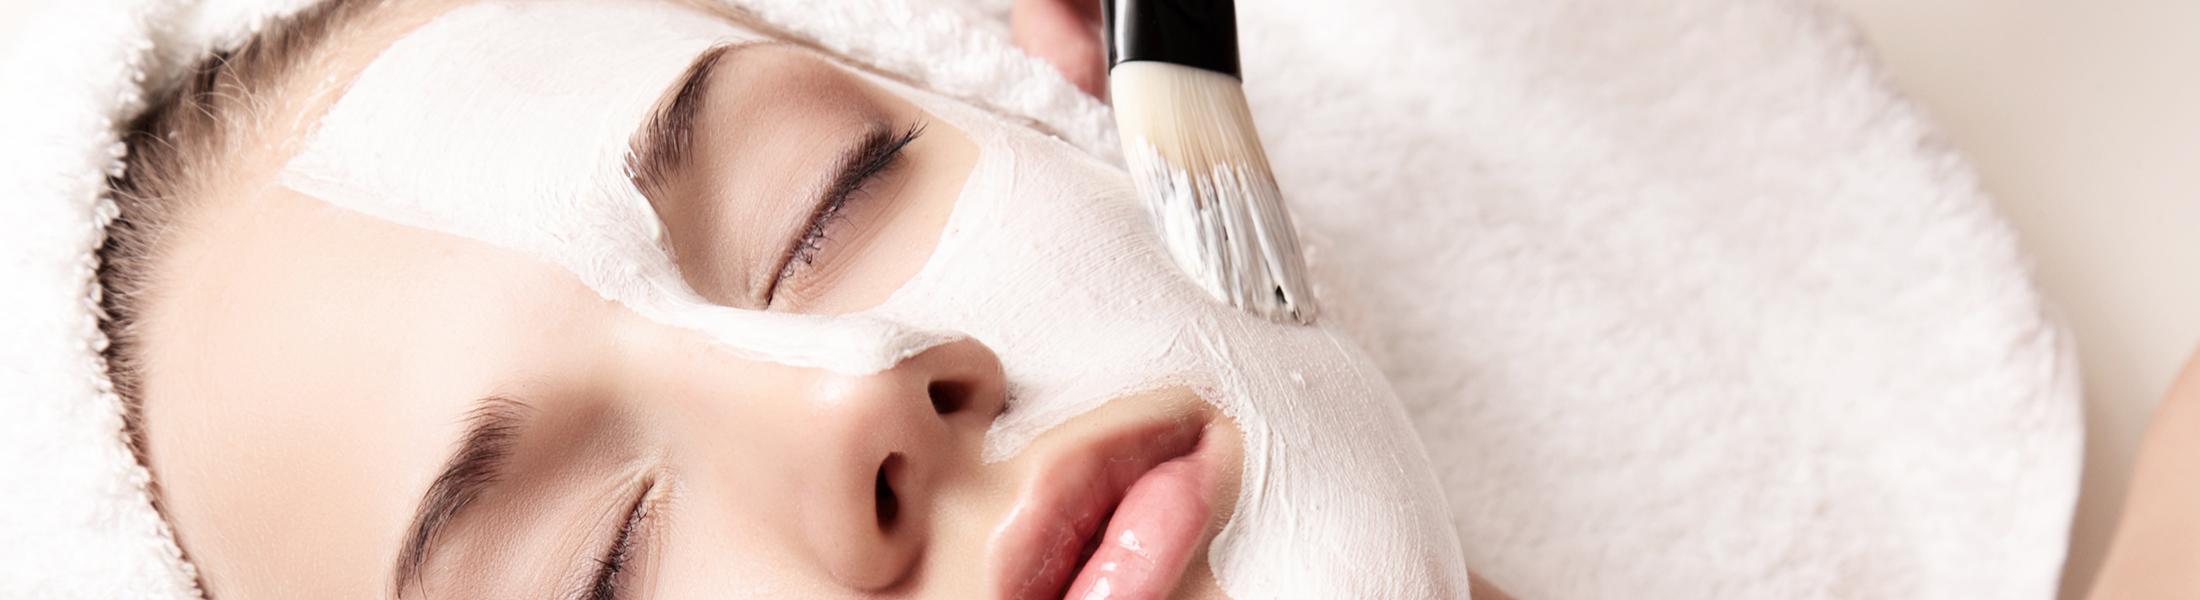 Skin & Facials - the Head Shoppe